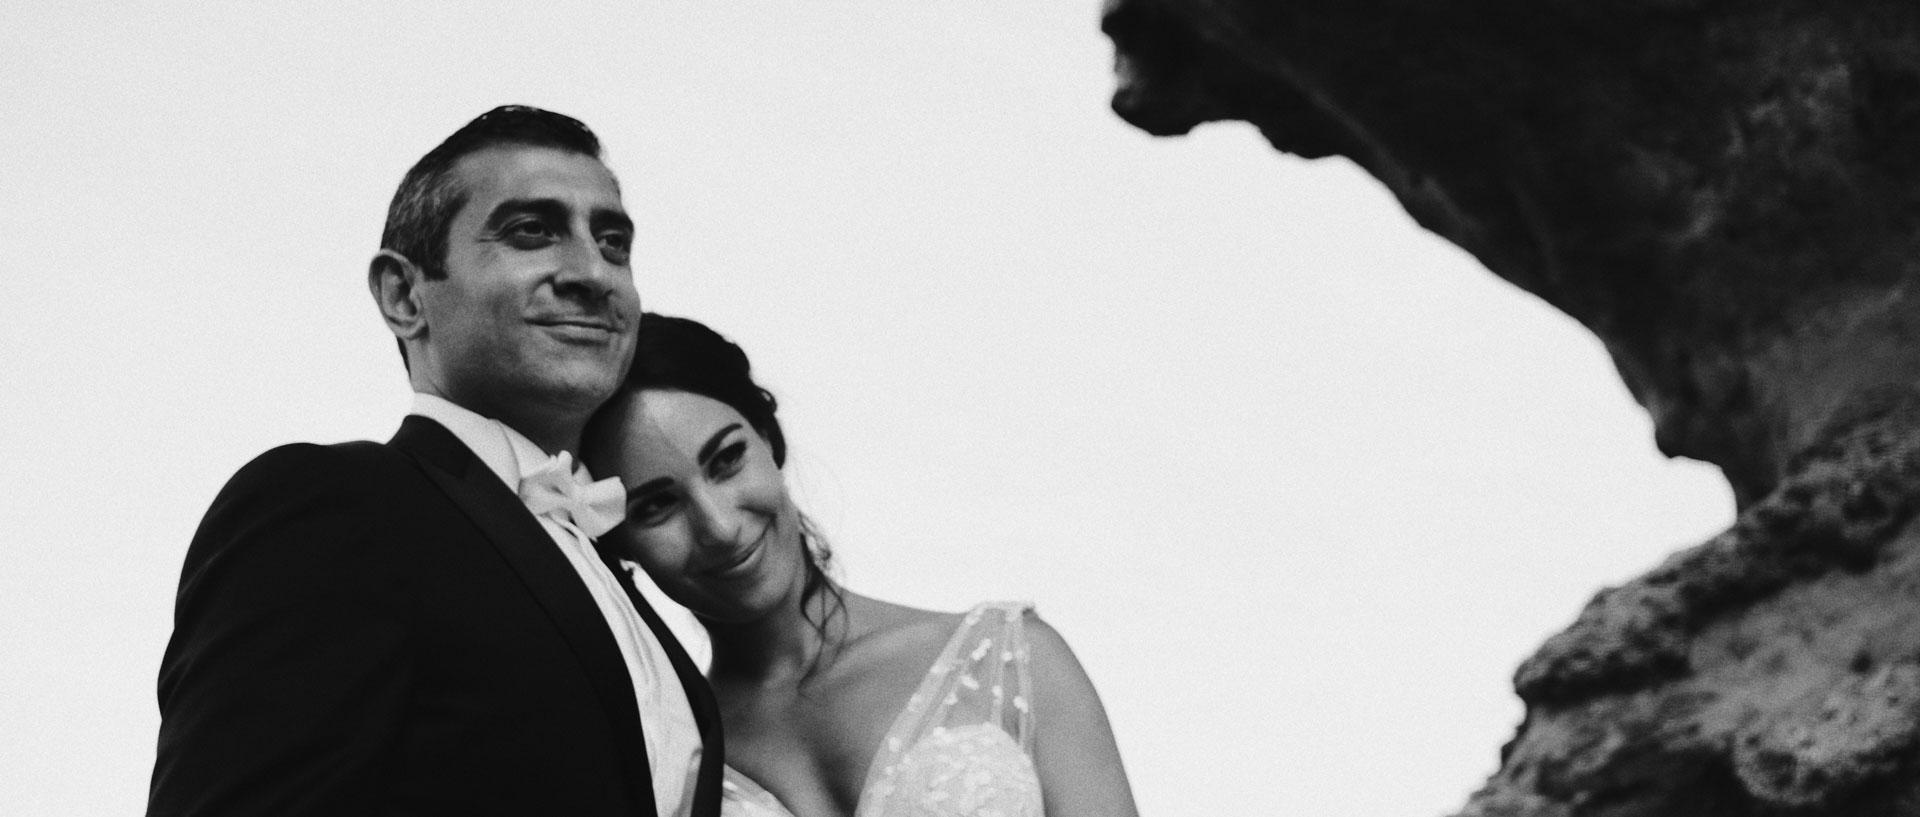 Natasha & Jad Wedding - Casino Biarritz (14).jpg